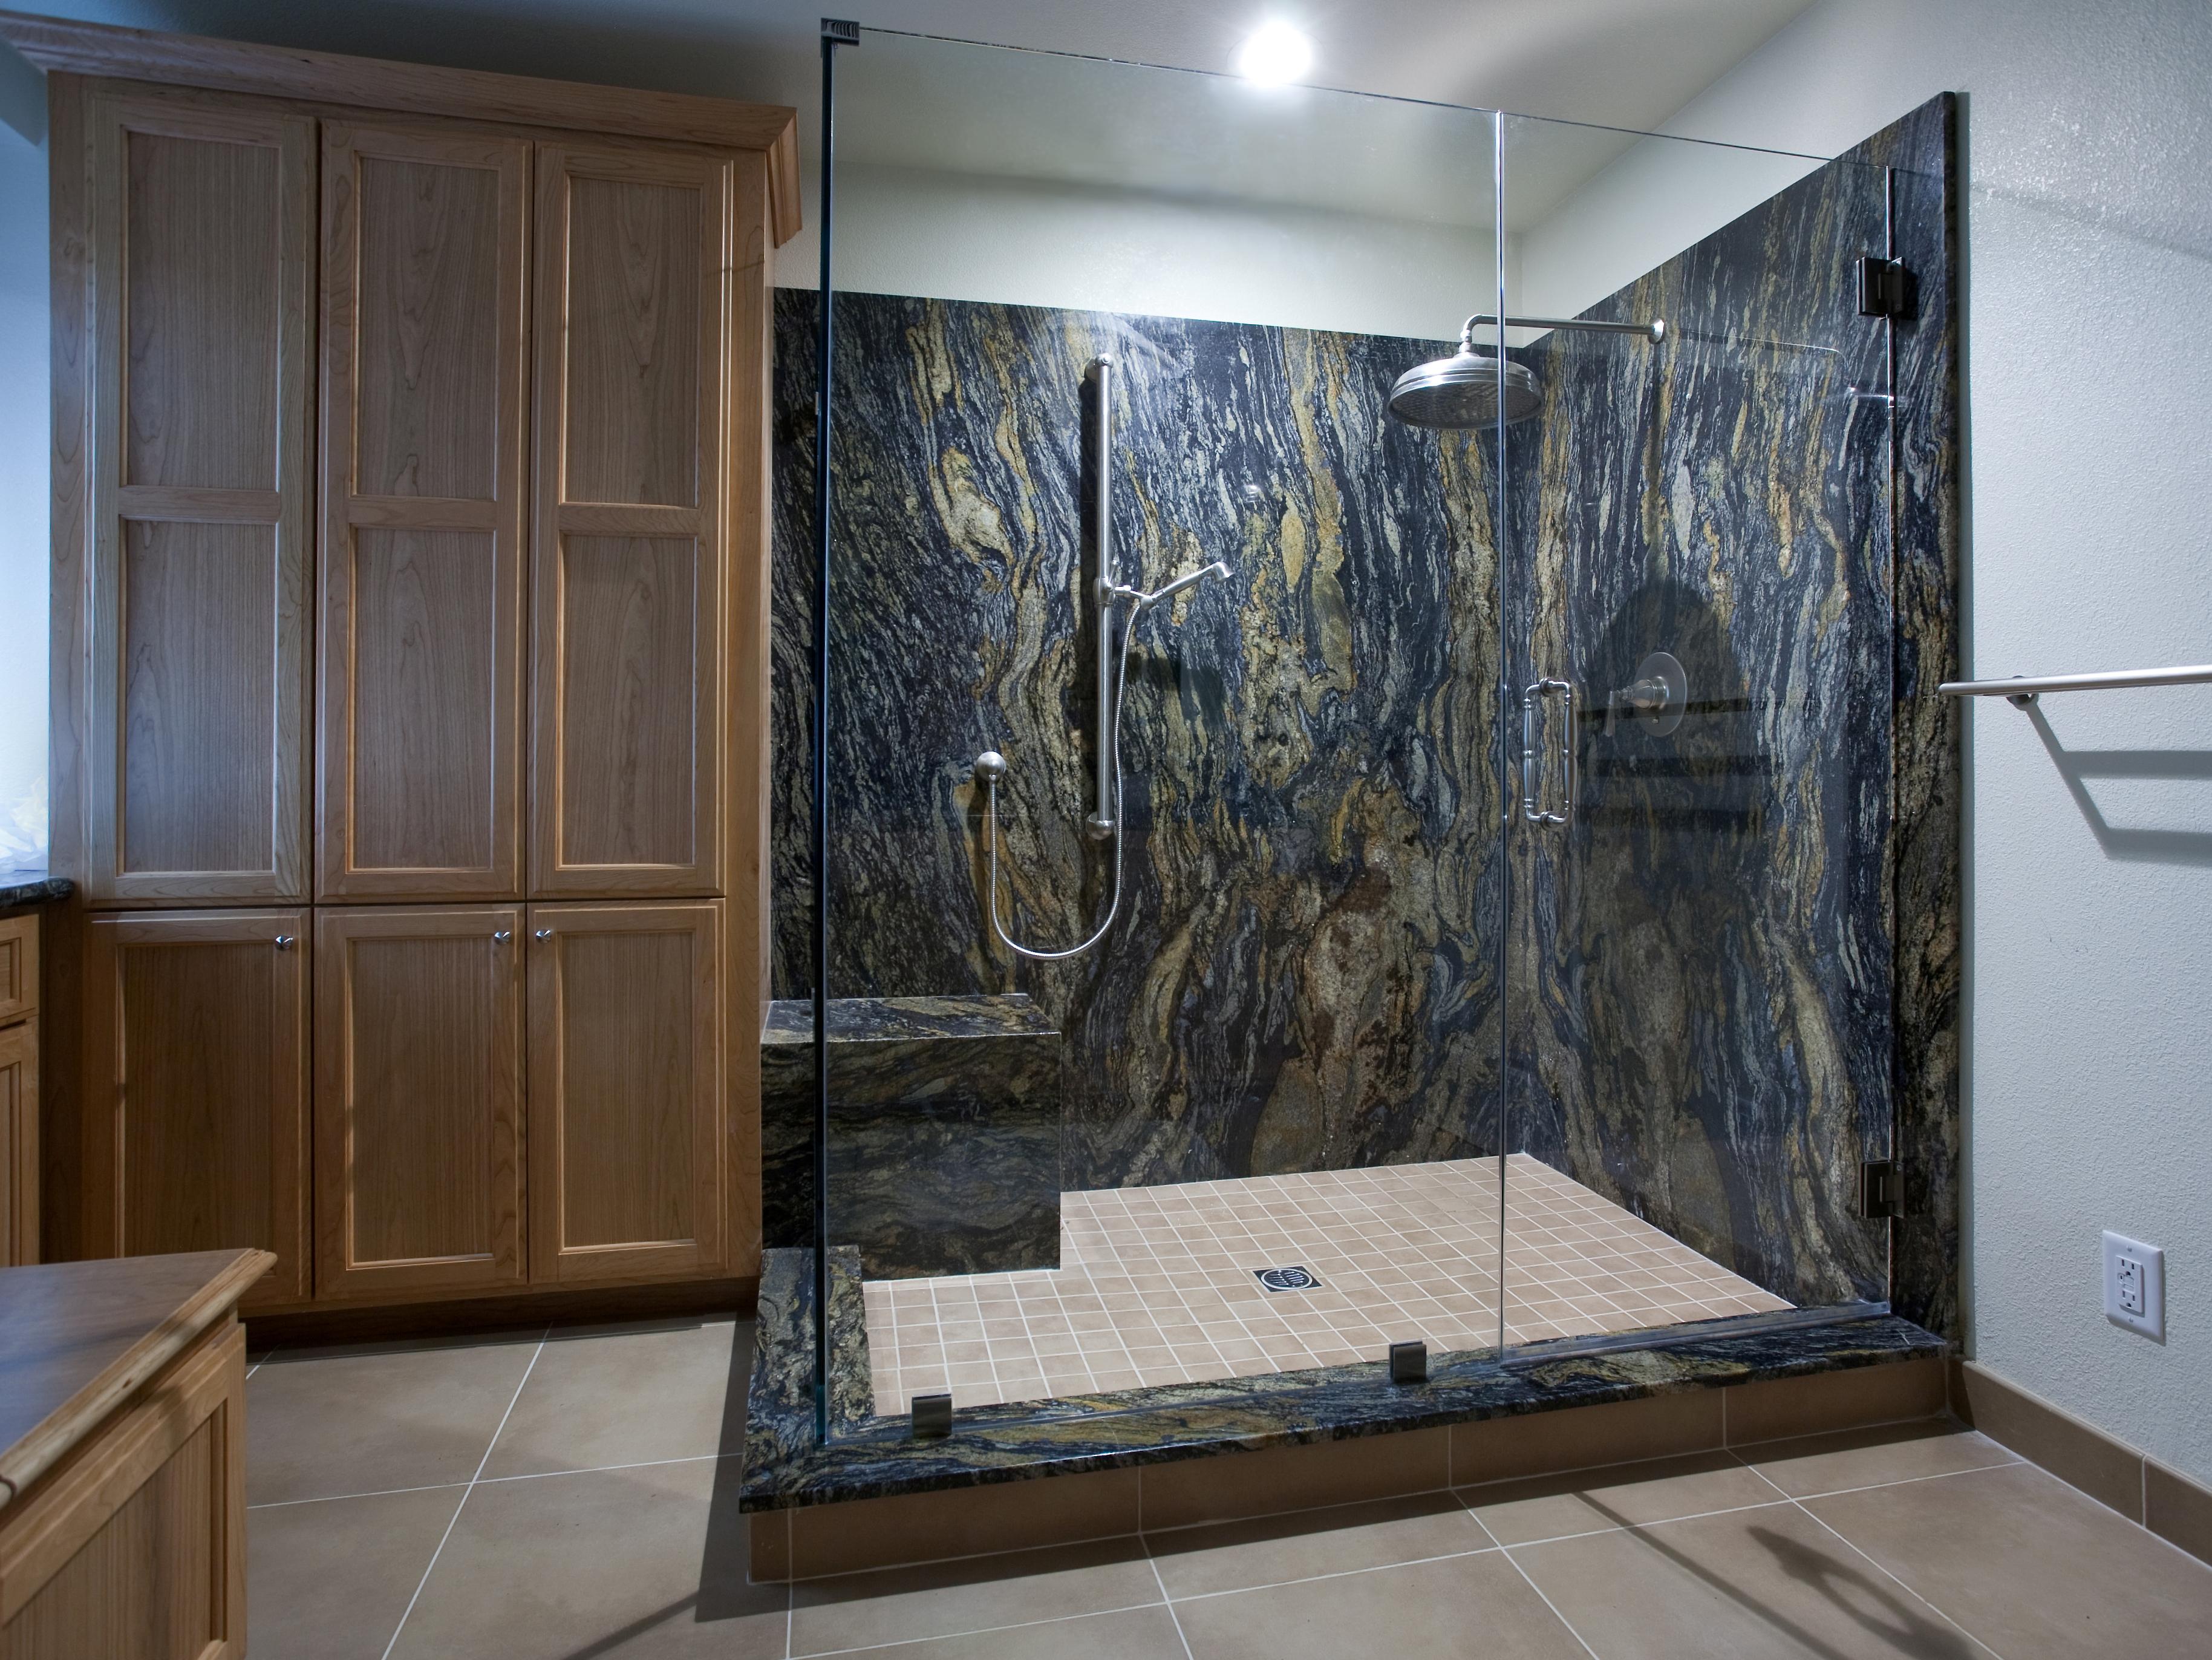 complete bathroom remodel cost